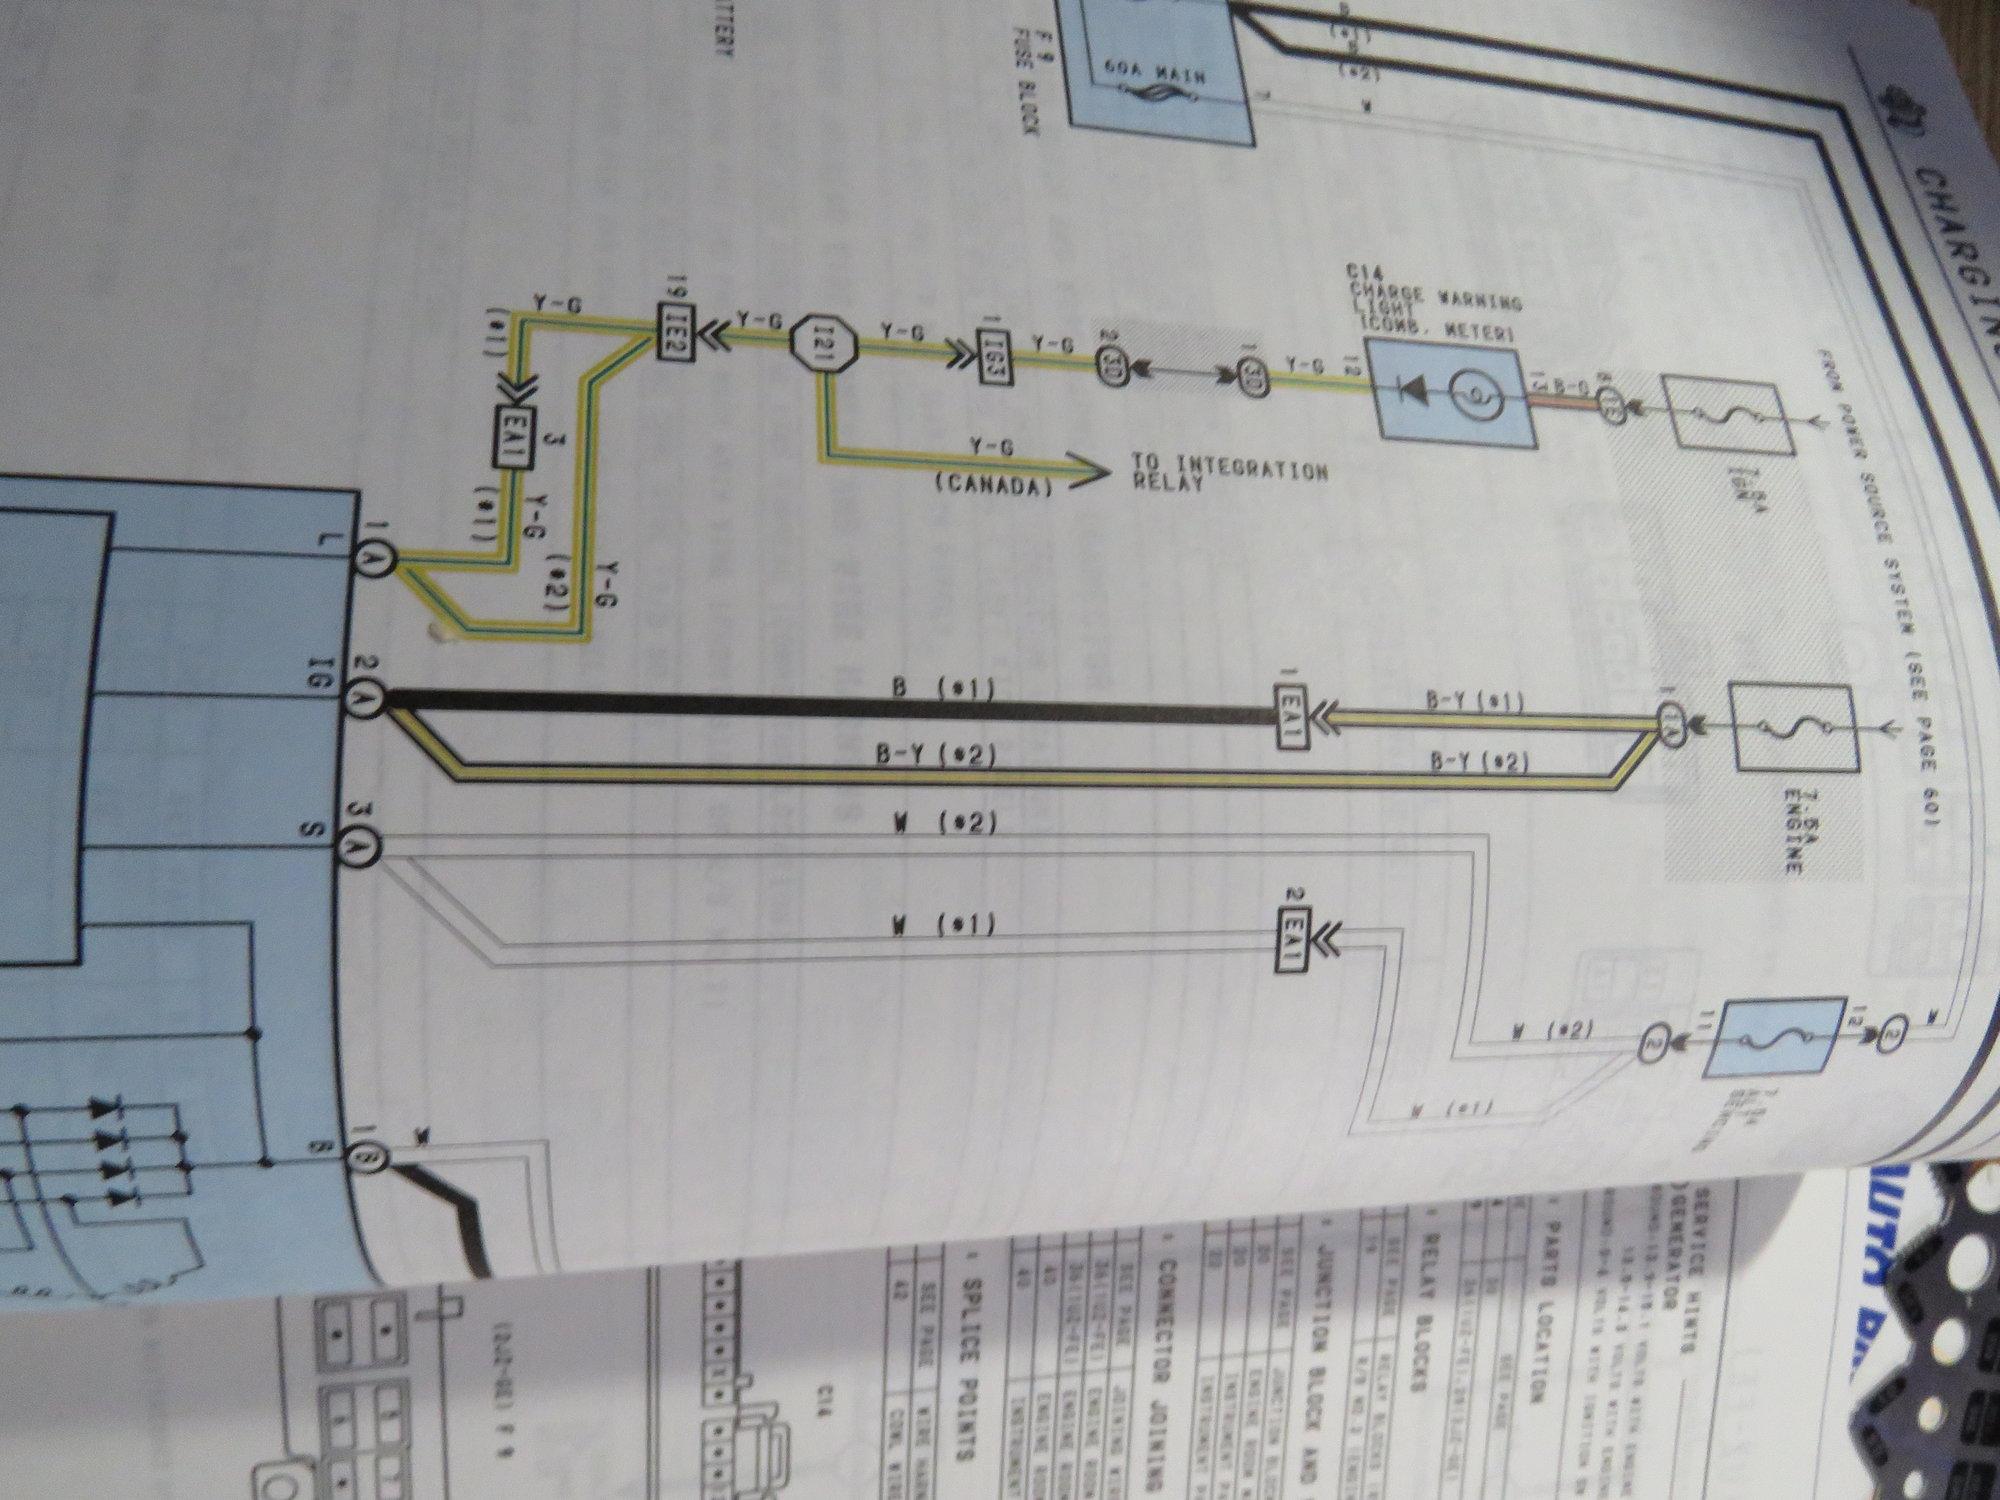 Sc300 Alternator Wiring - Fusebox and Wiring Diagram symbol-hut -  symbol-hut.sirtarghe.itdiagram database